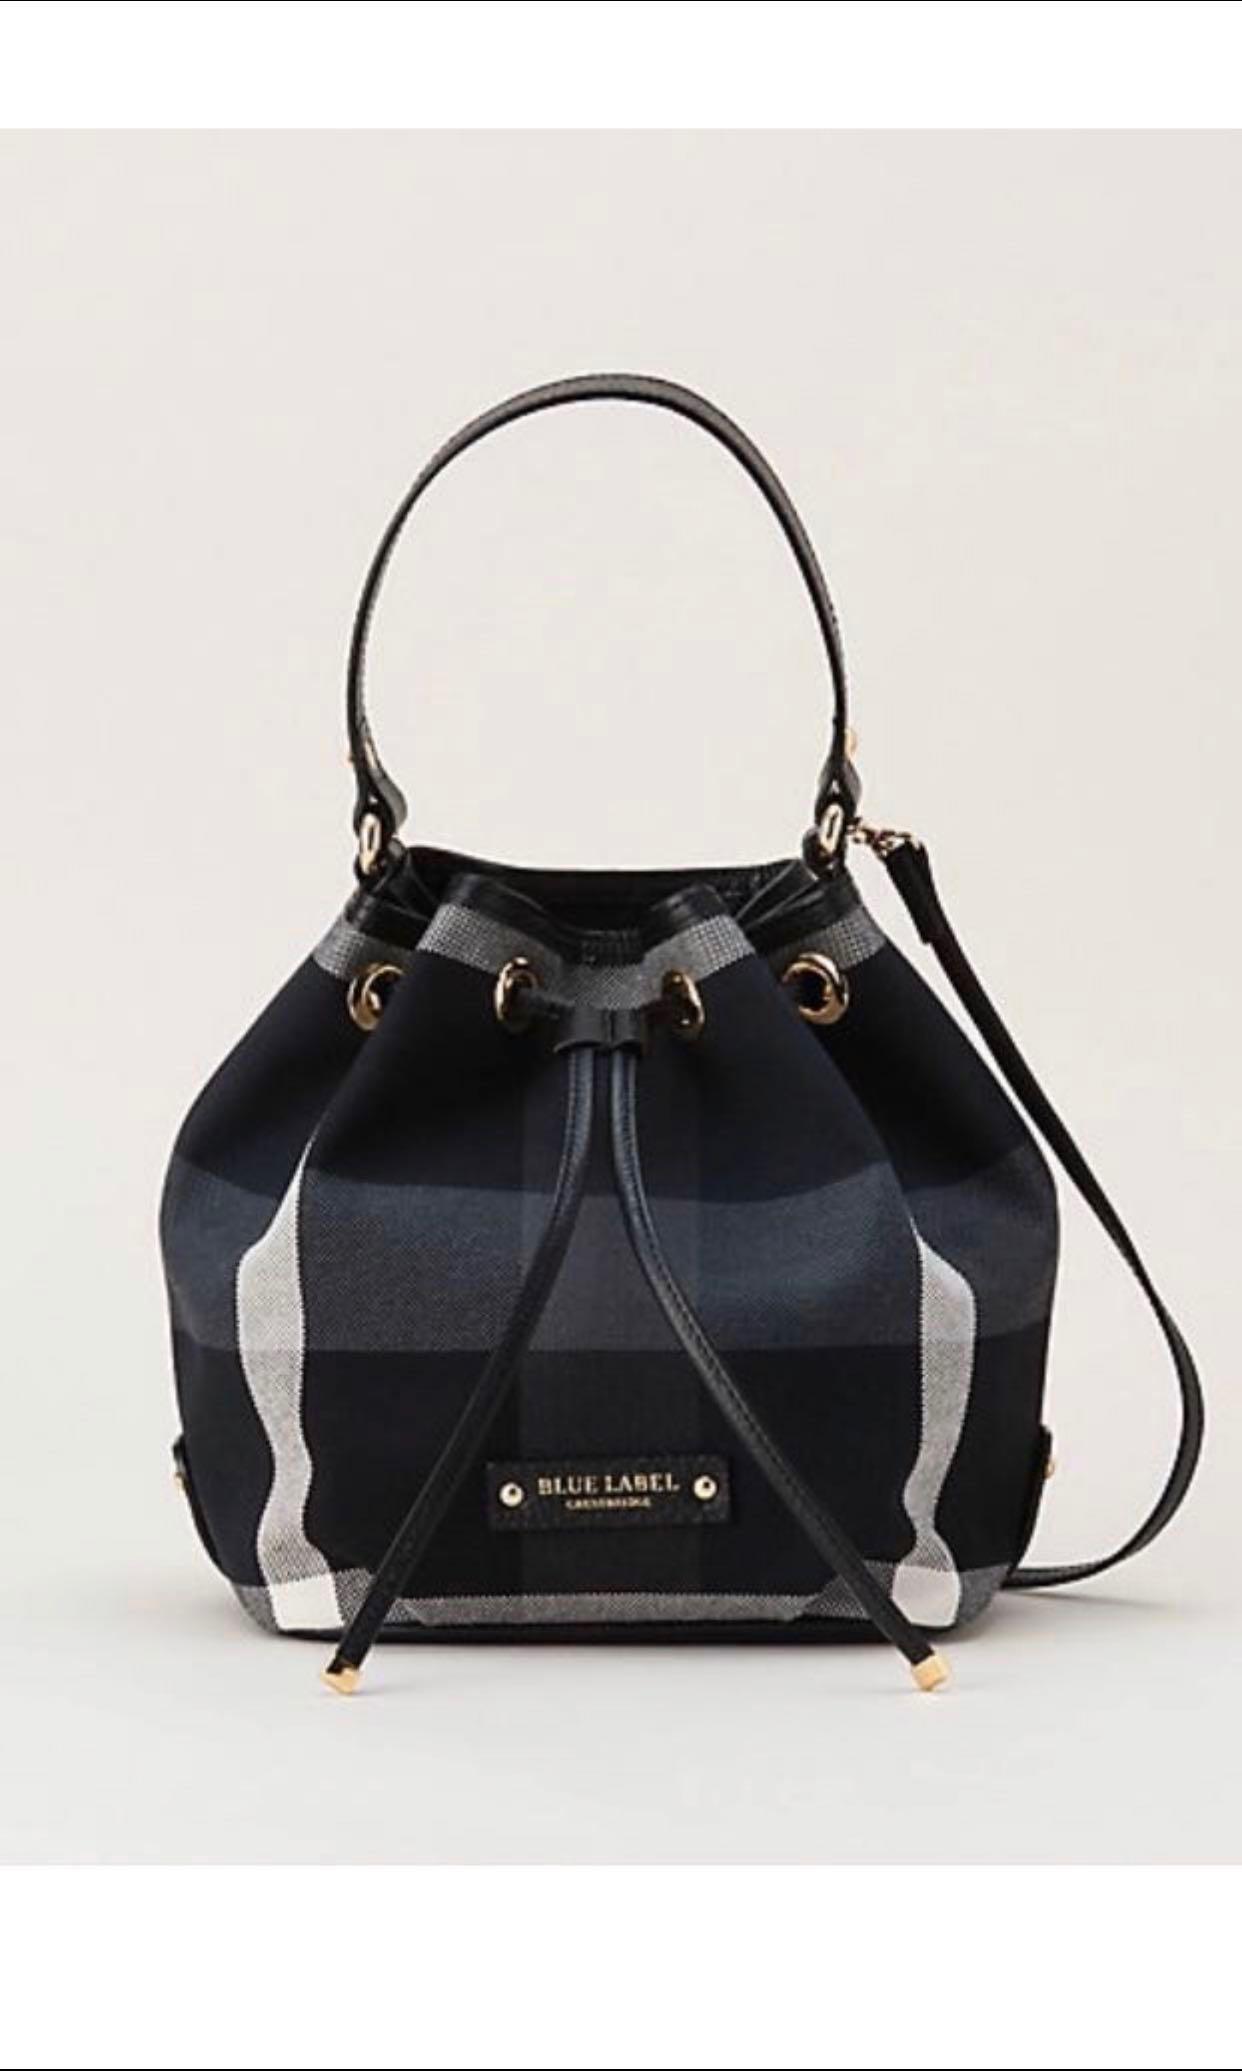 6501375698c4 [ Pending ] Burberry Blue Label Crestbridge Bucket Bag, Luxury, Bags &  Wallets, Handbags on Carousell